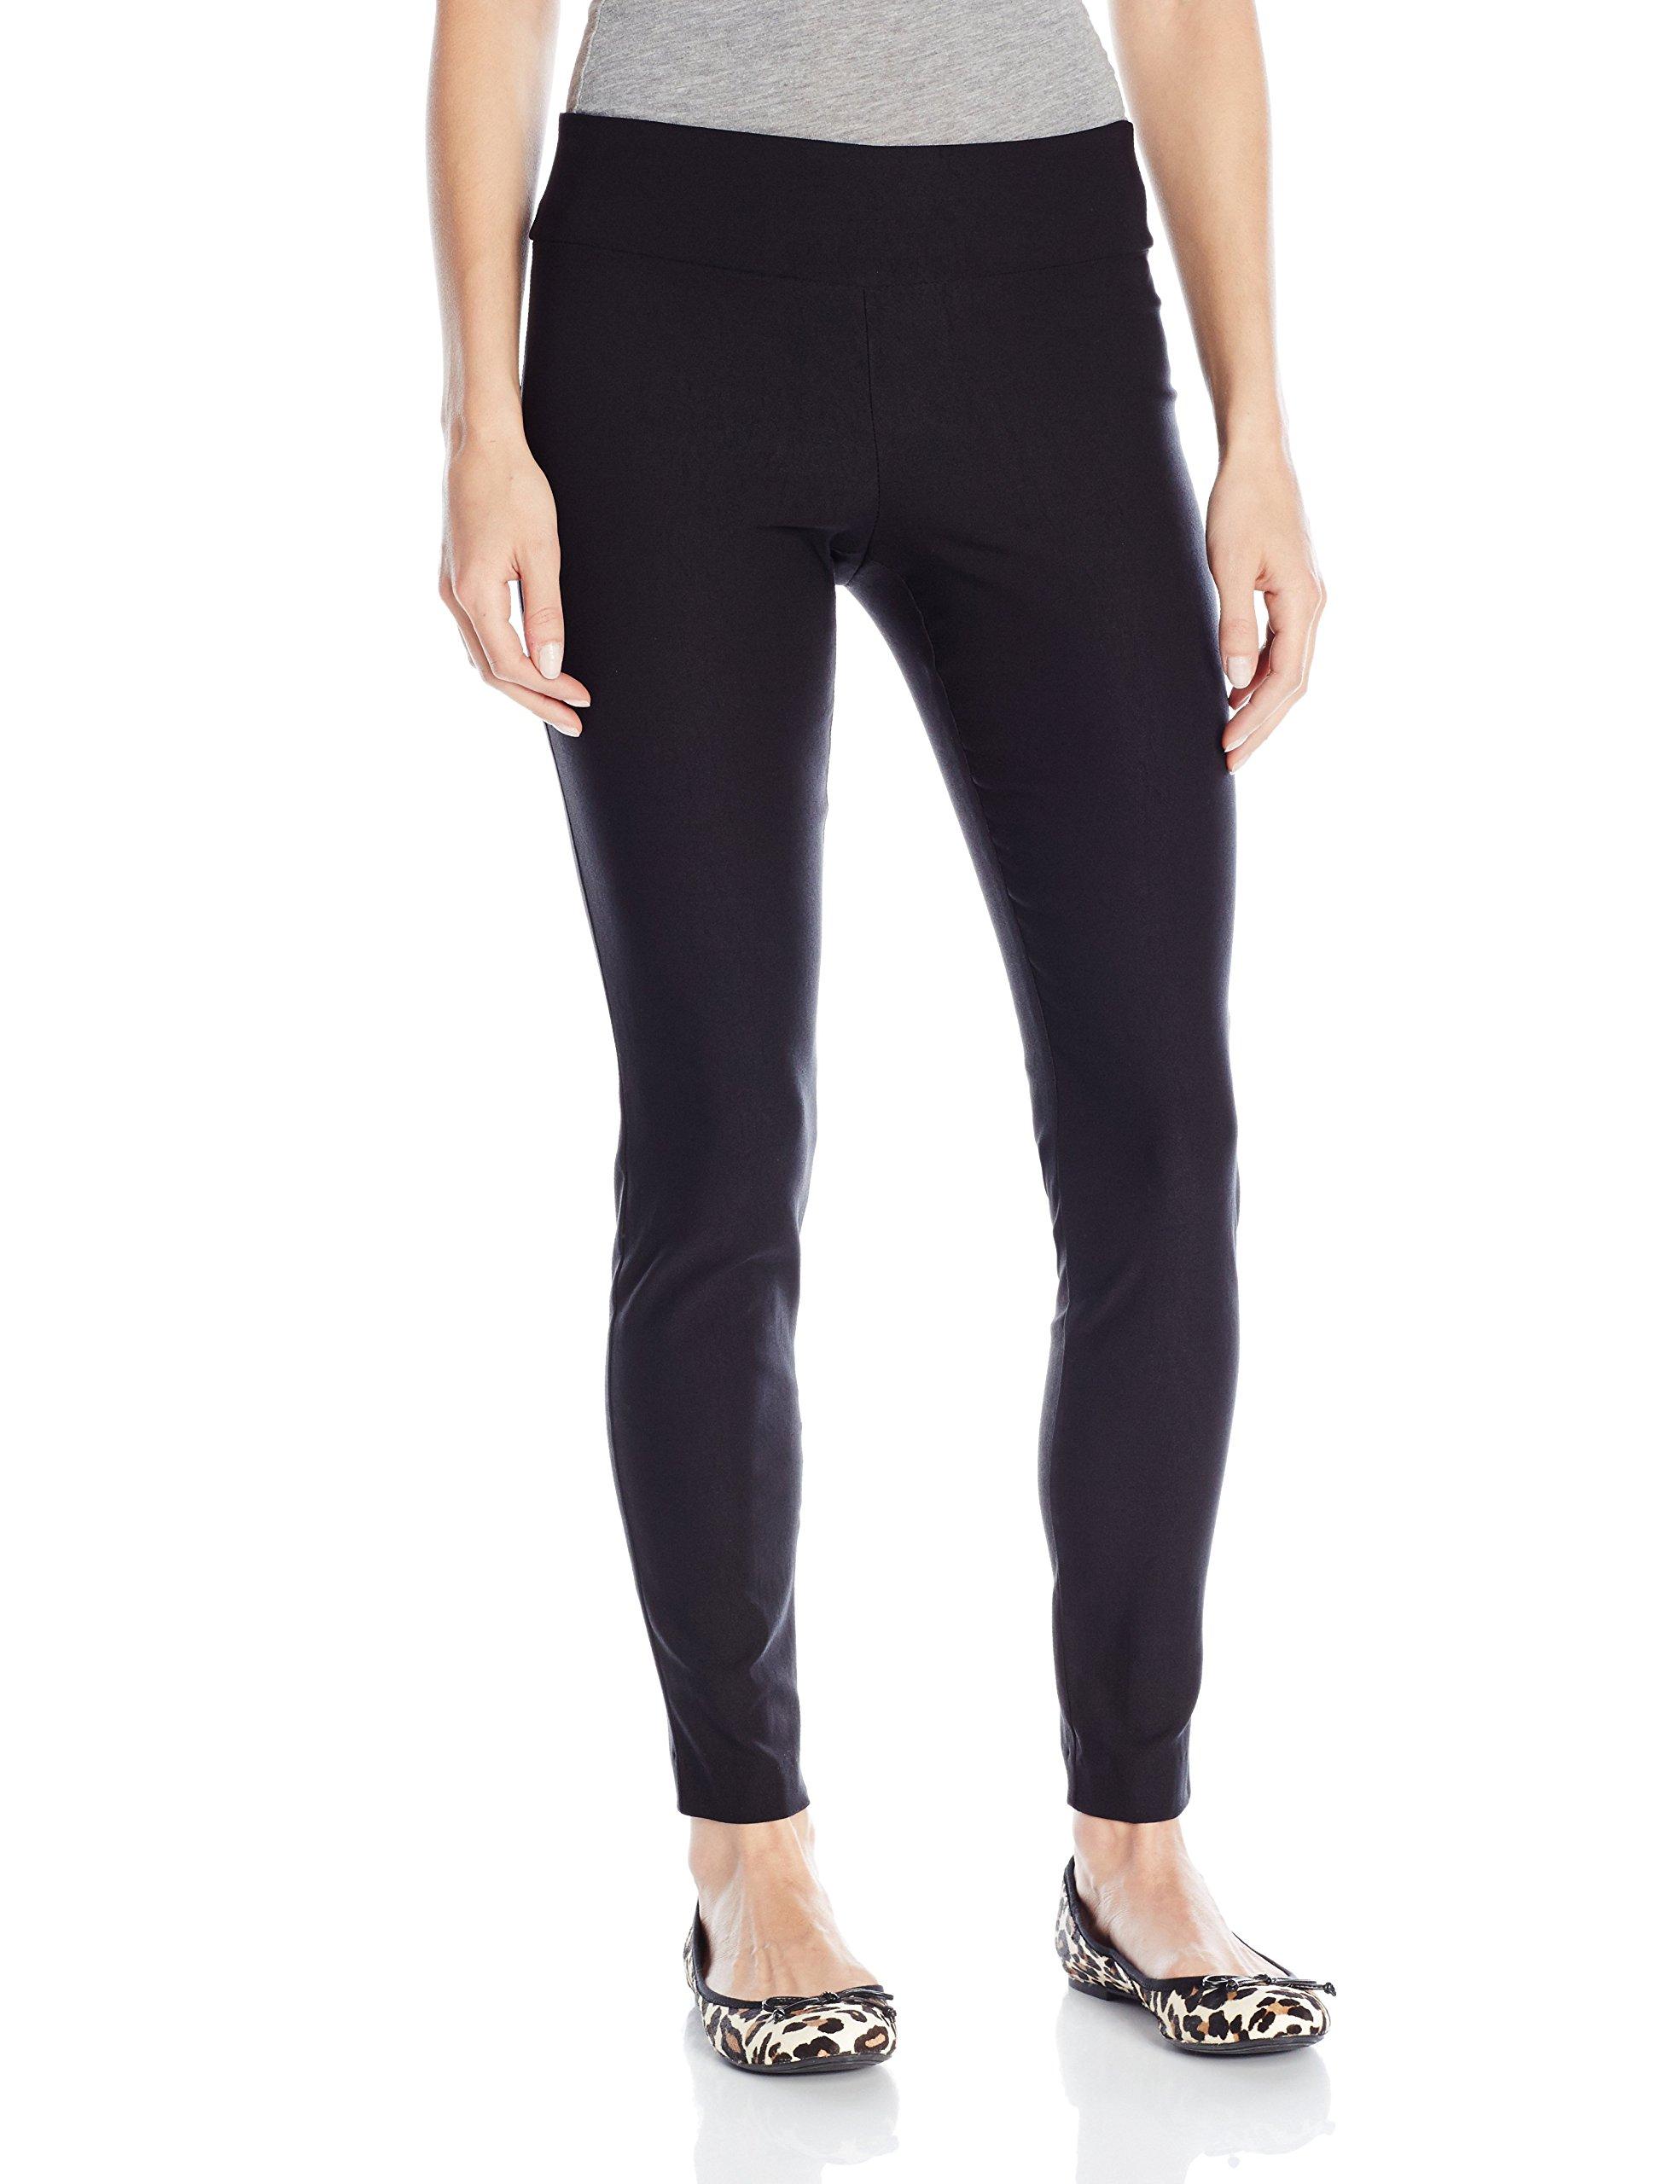 A. Byer Juniors Skinny Pull on Pant, Black, Medium